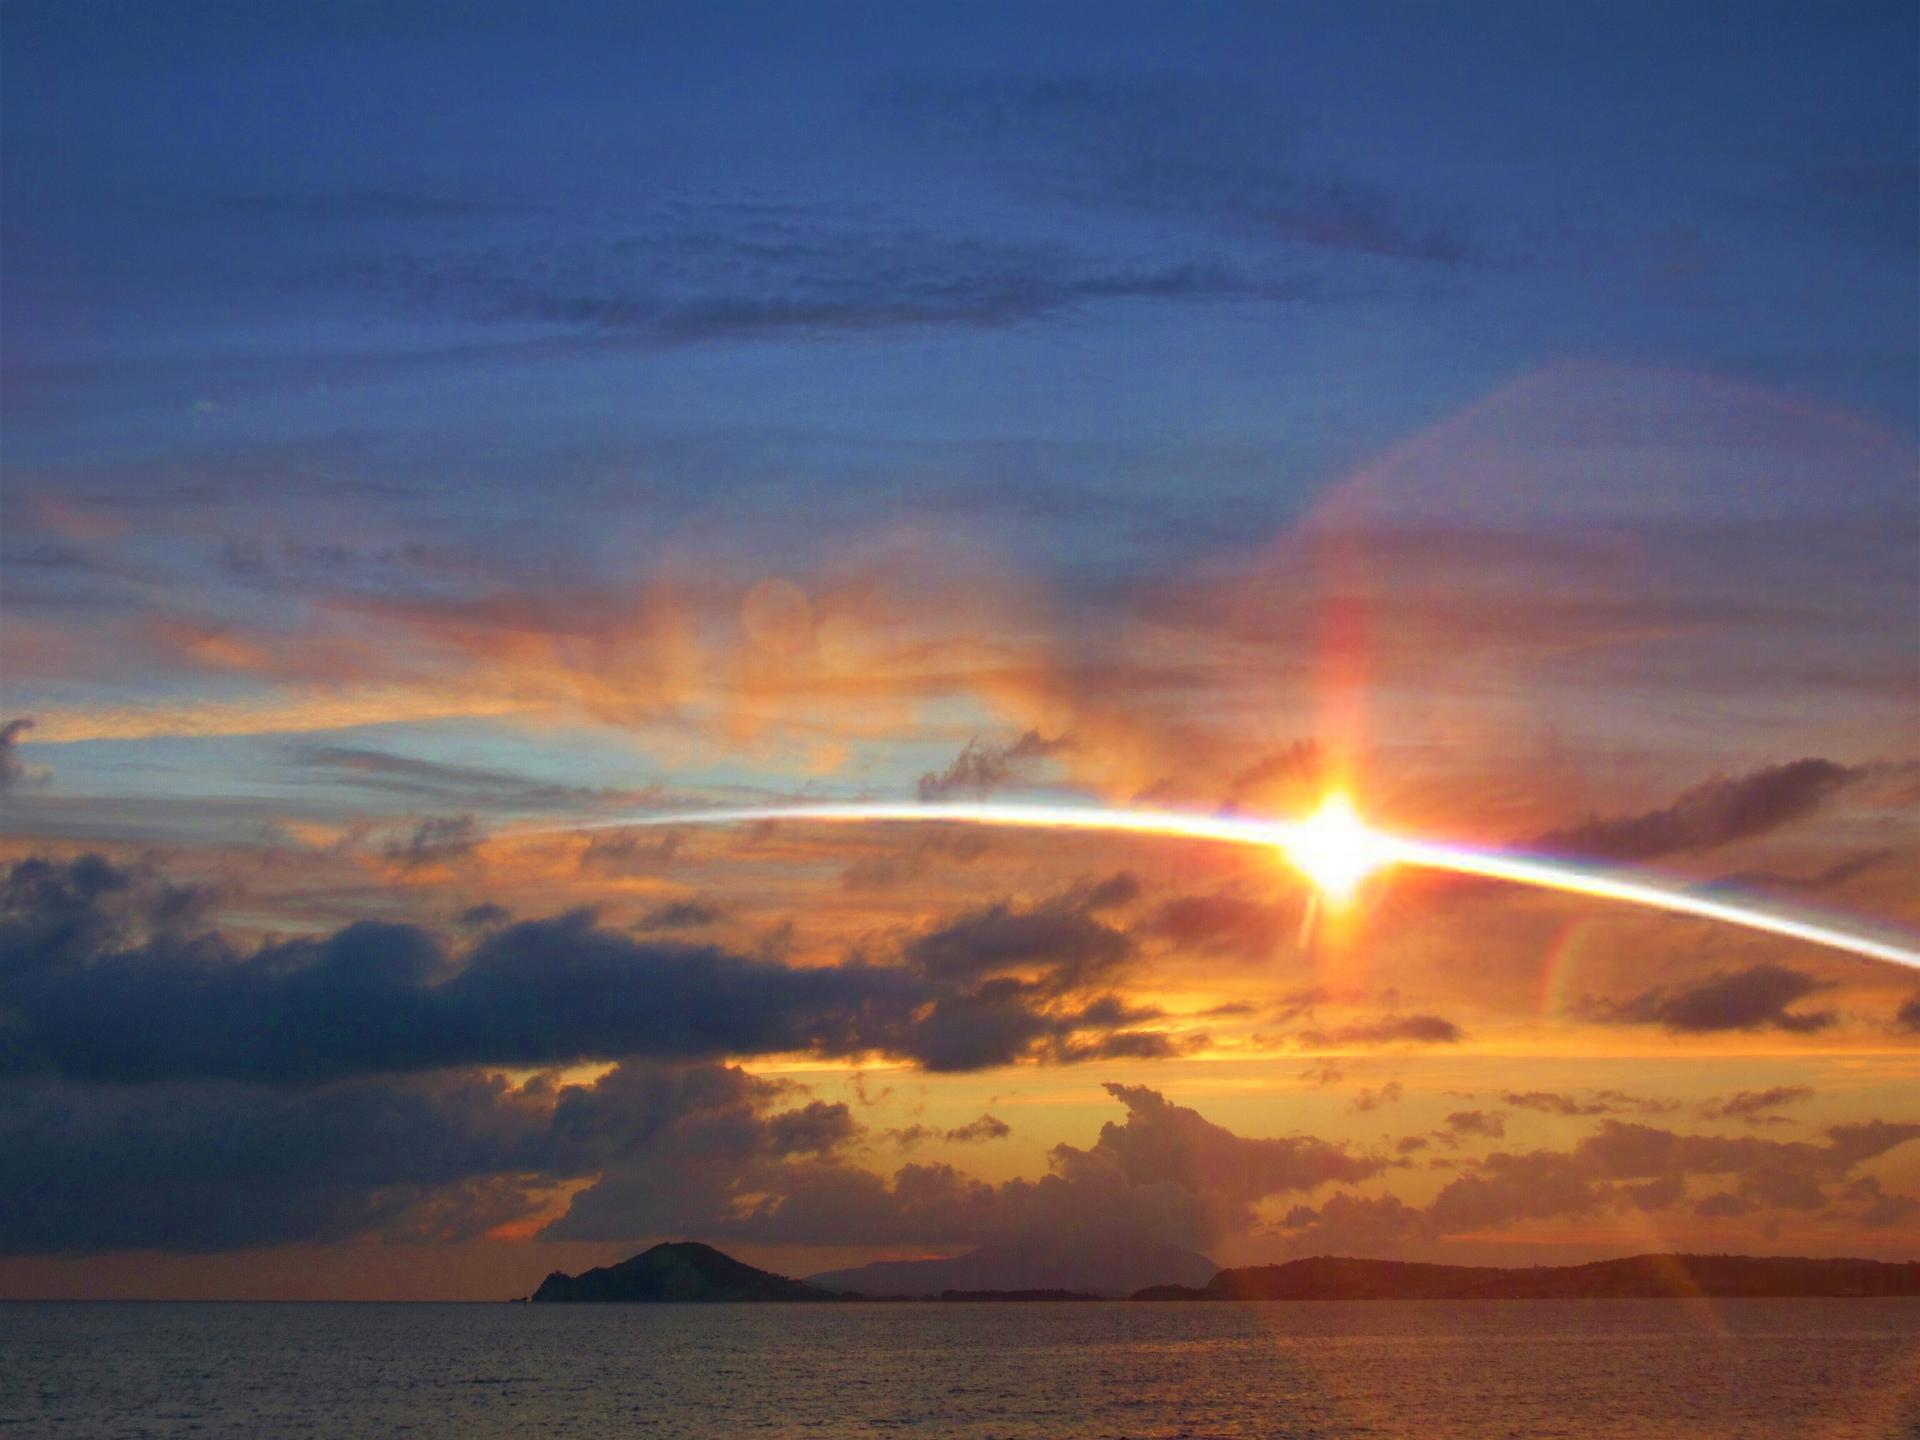 Sunset over Bagnoli ( Naples - Italy ).